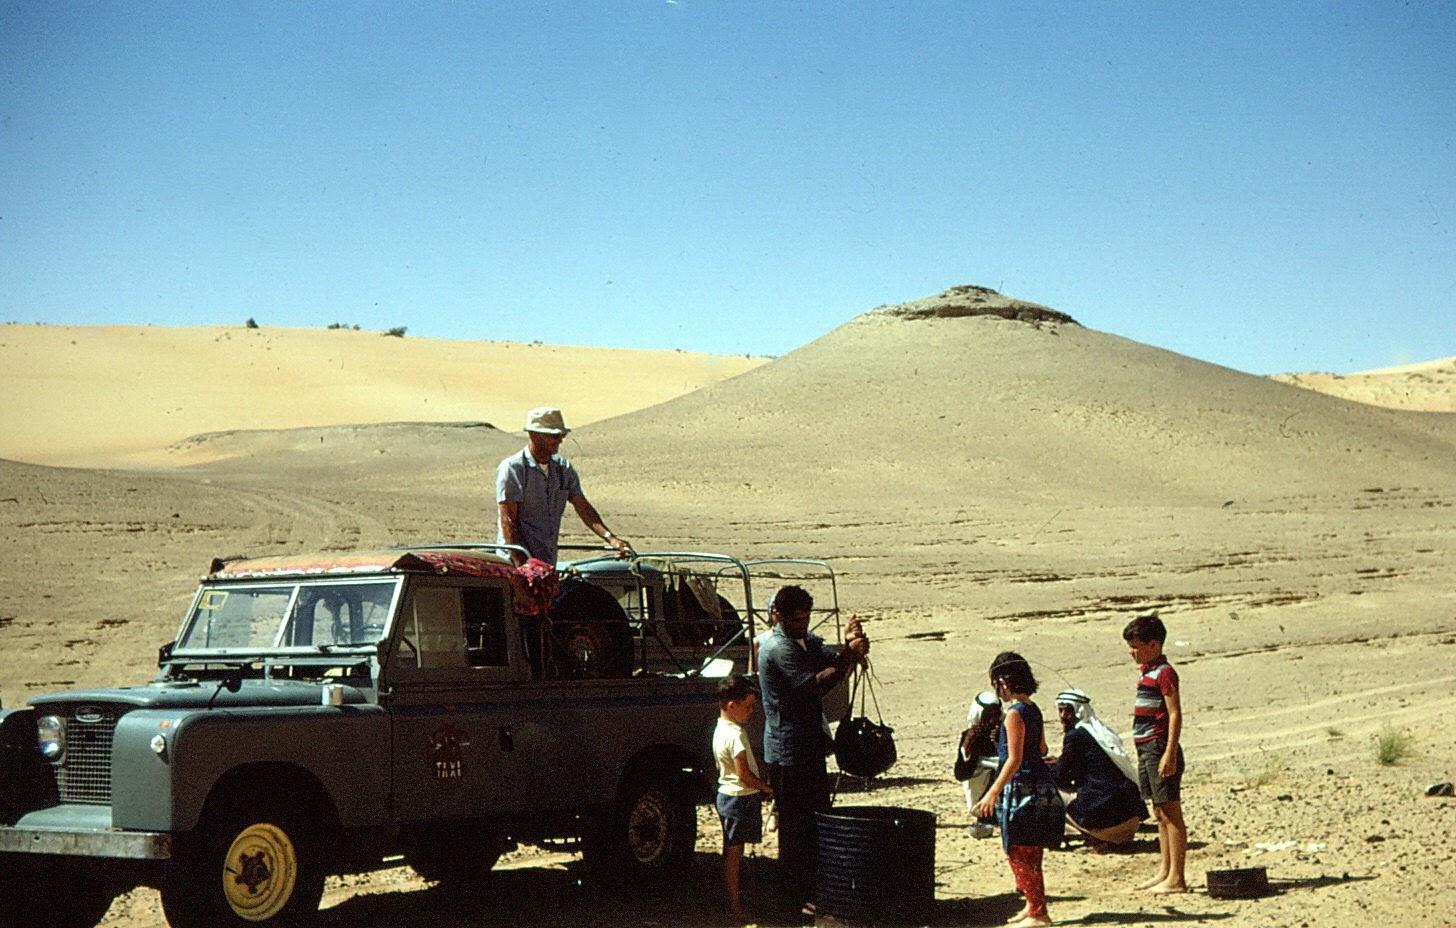 Family on a trek through the sands.jpg